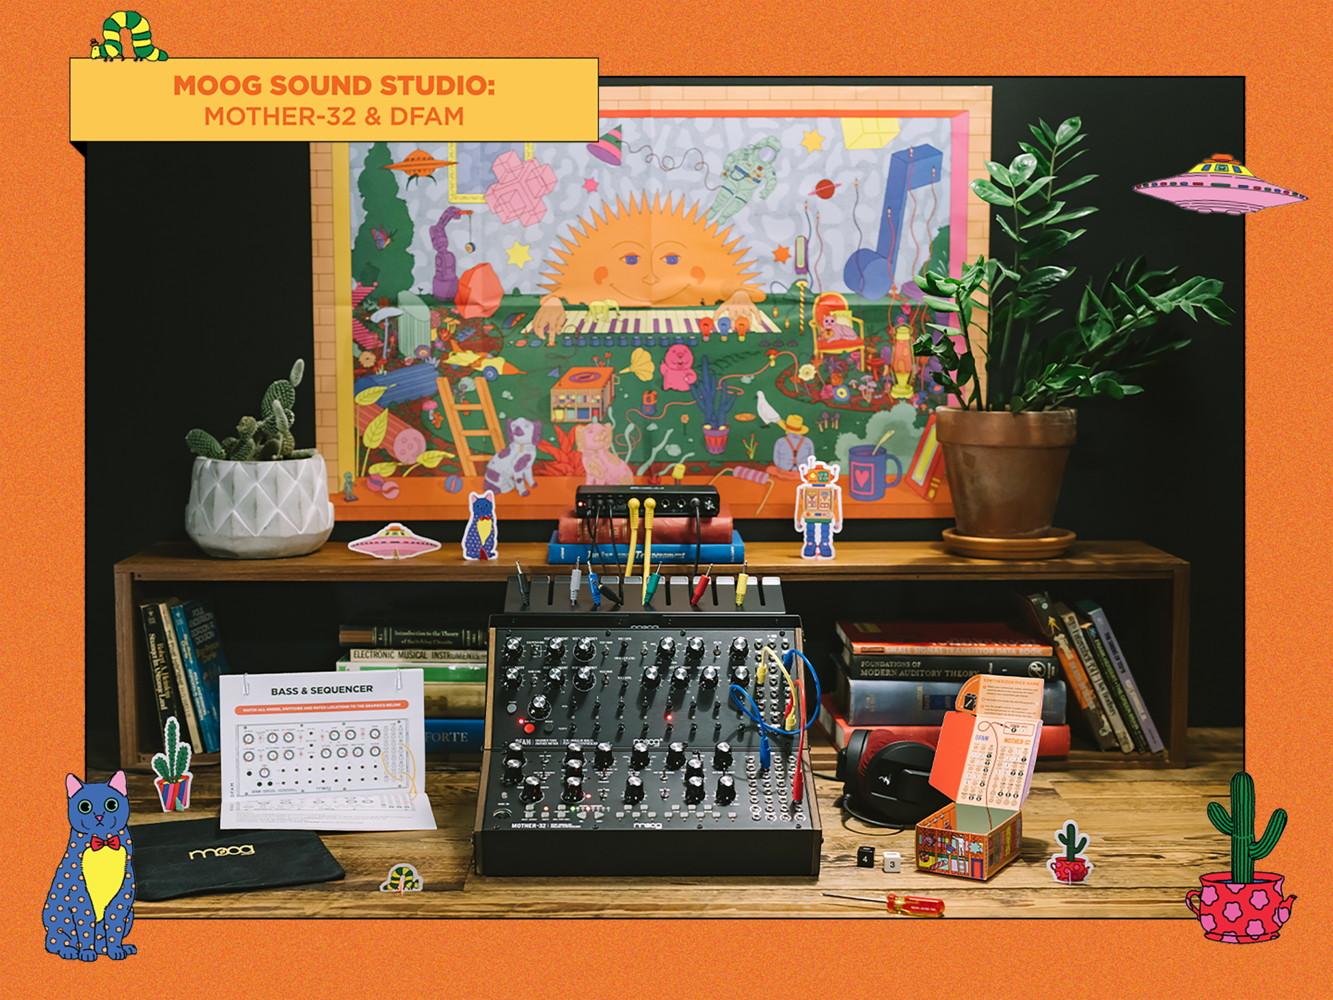 Moog Sound Studio Mother-32 DFAM